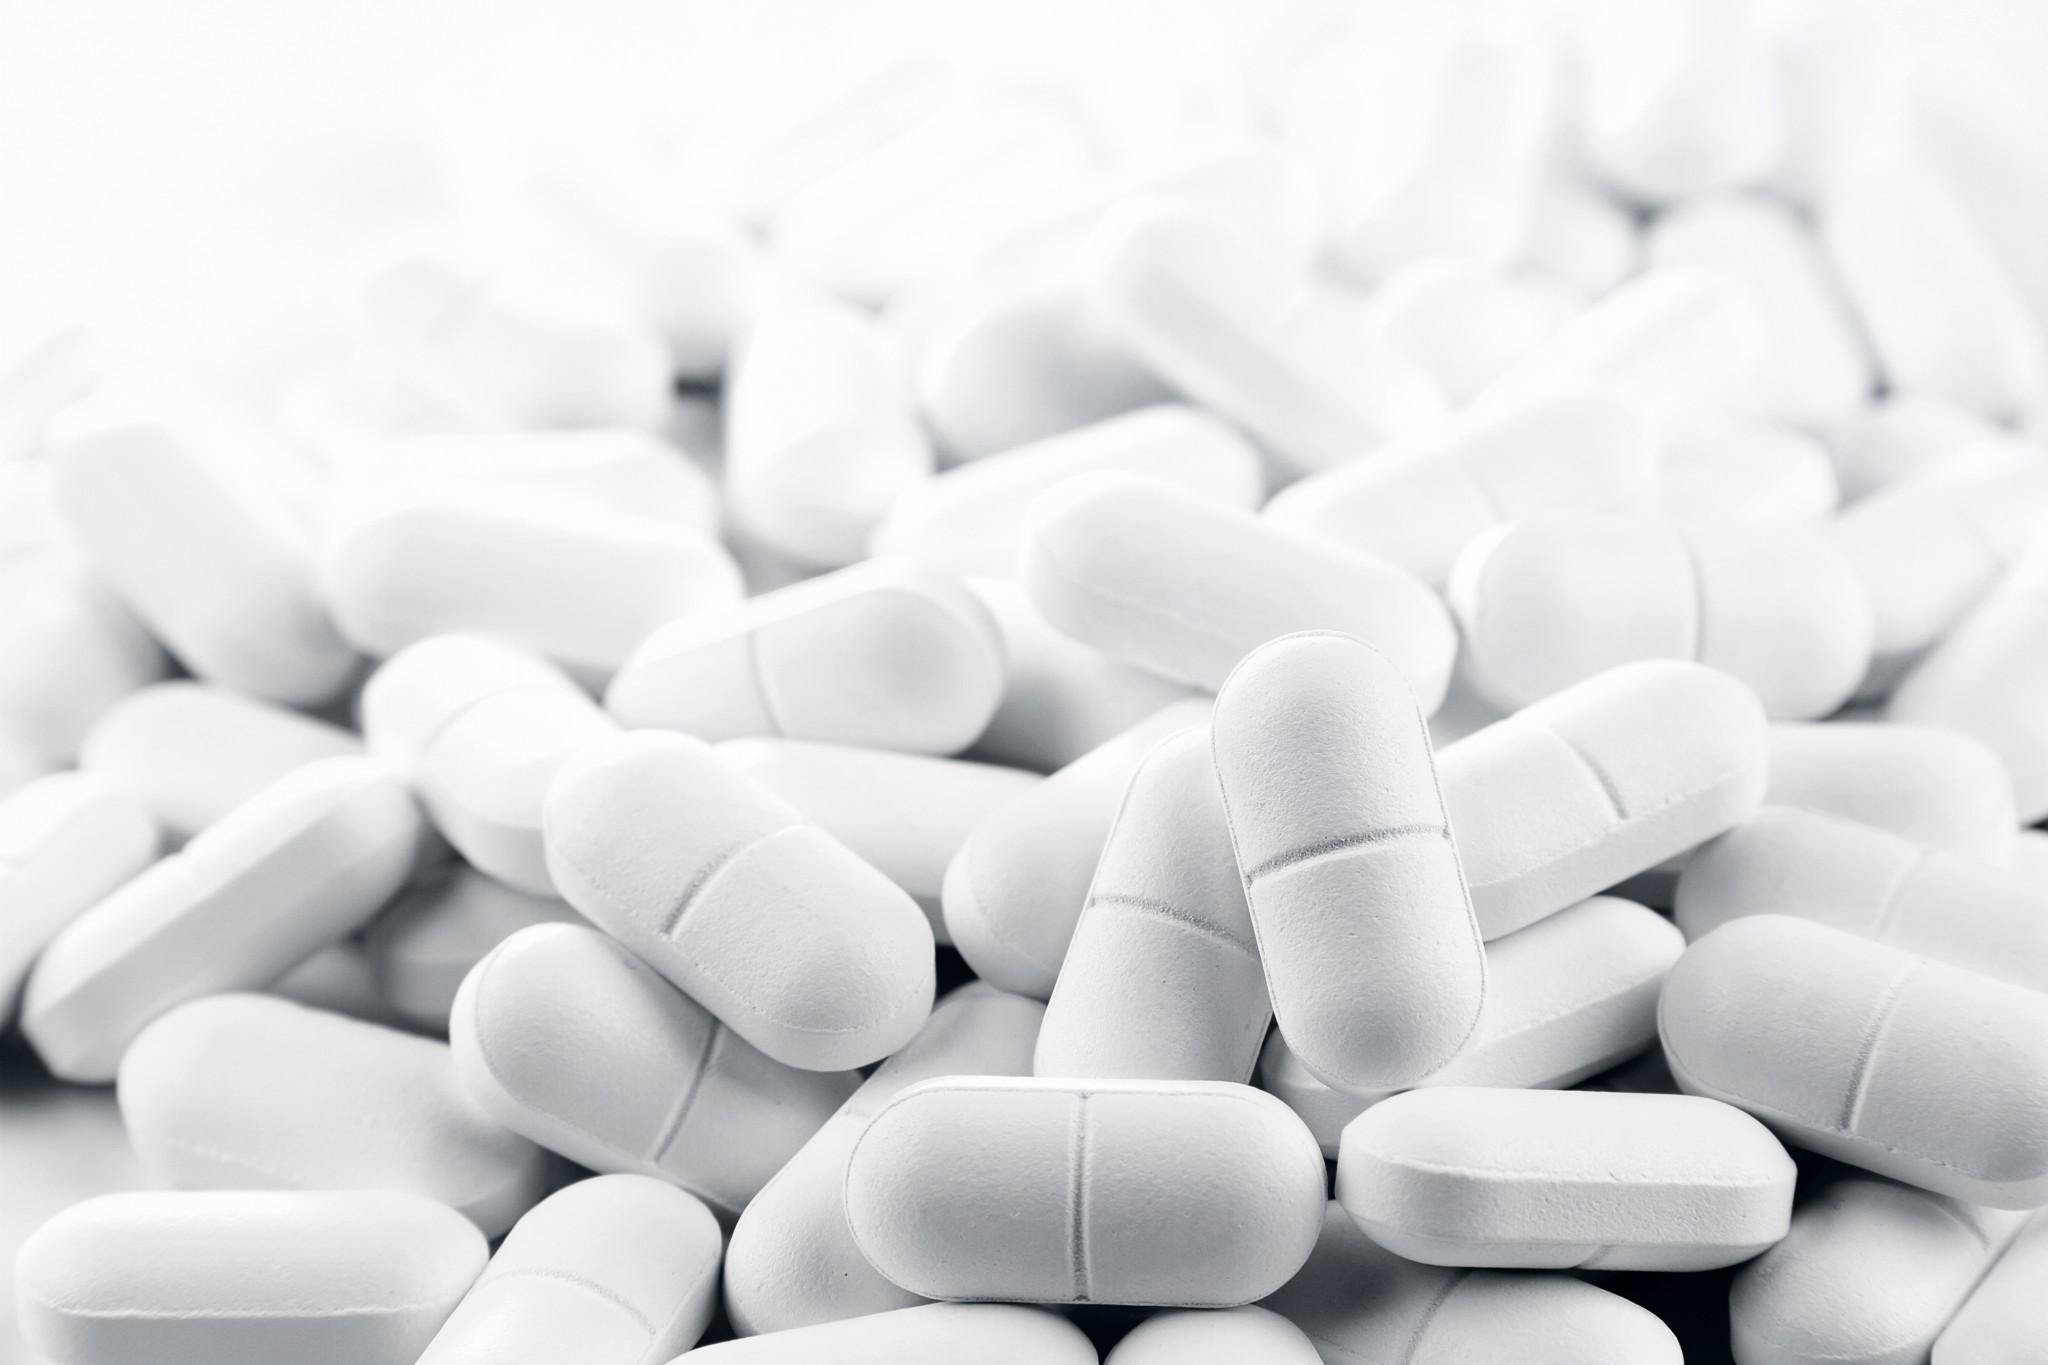 Aniracetam Review: Benefits, Dosage, Side Effects